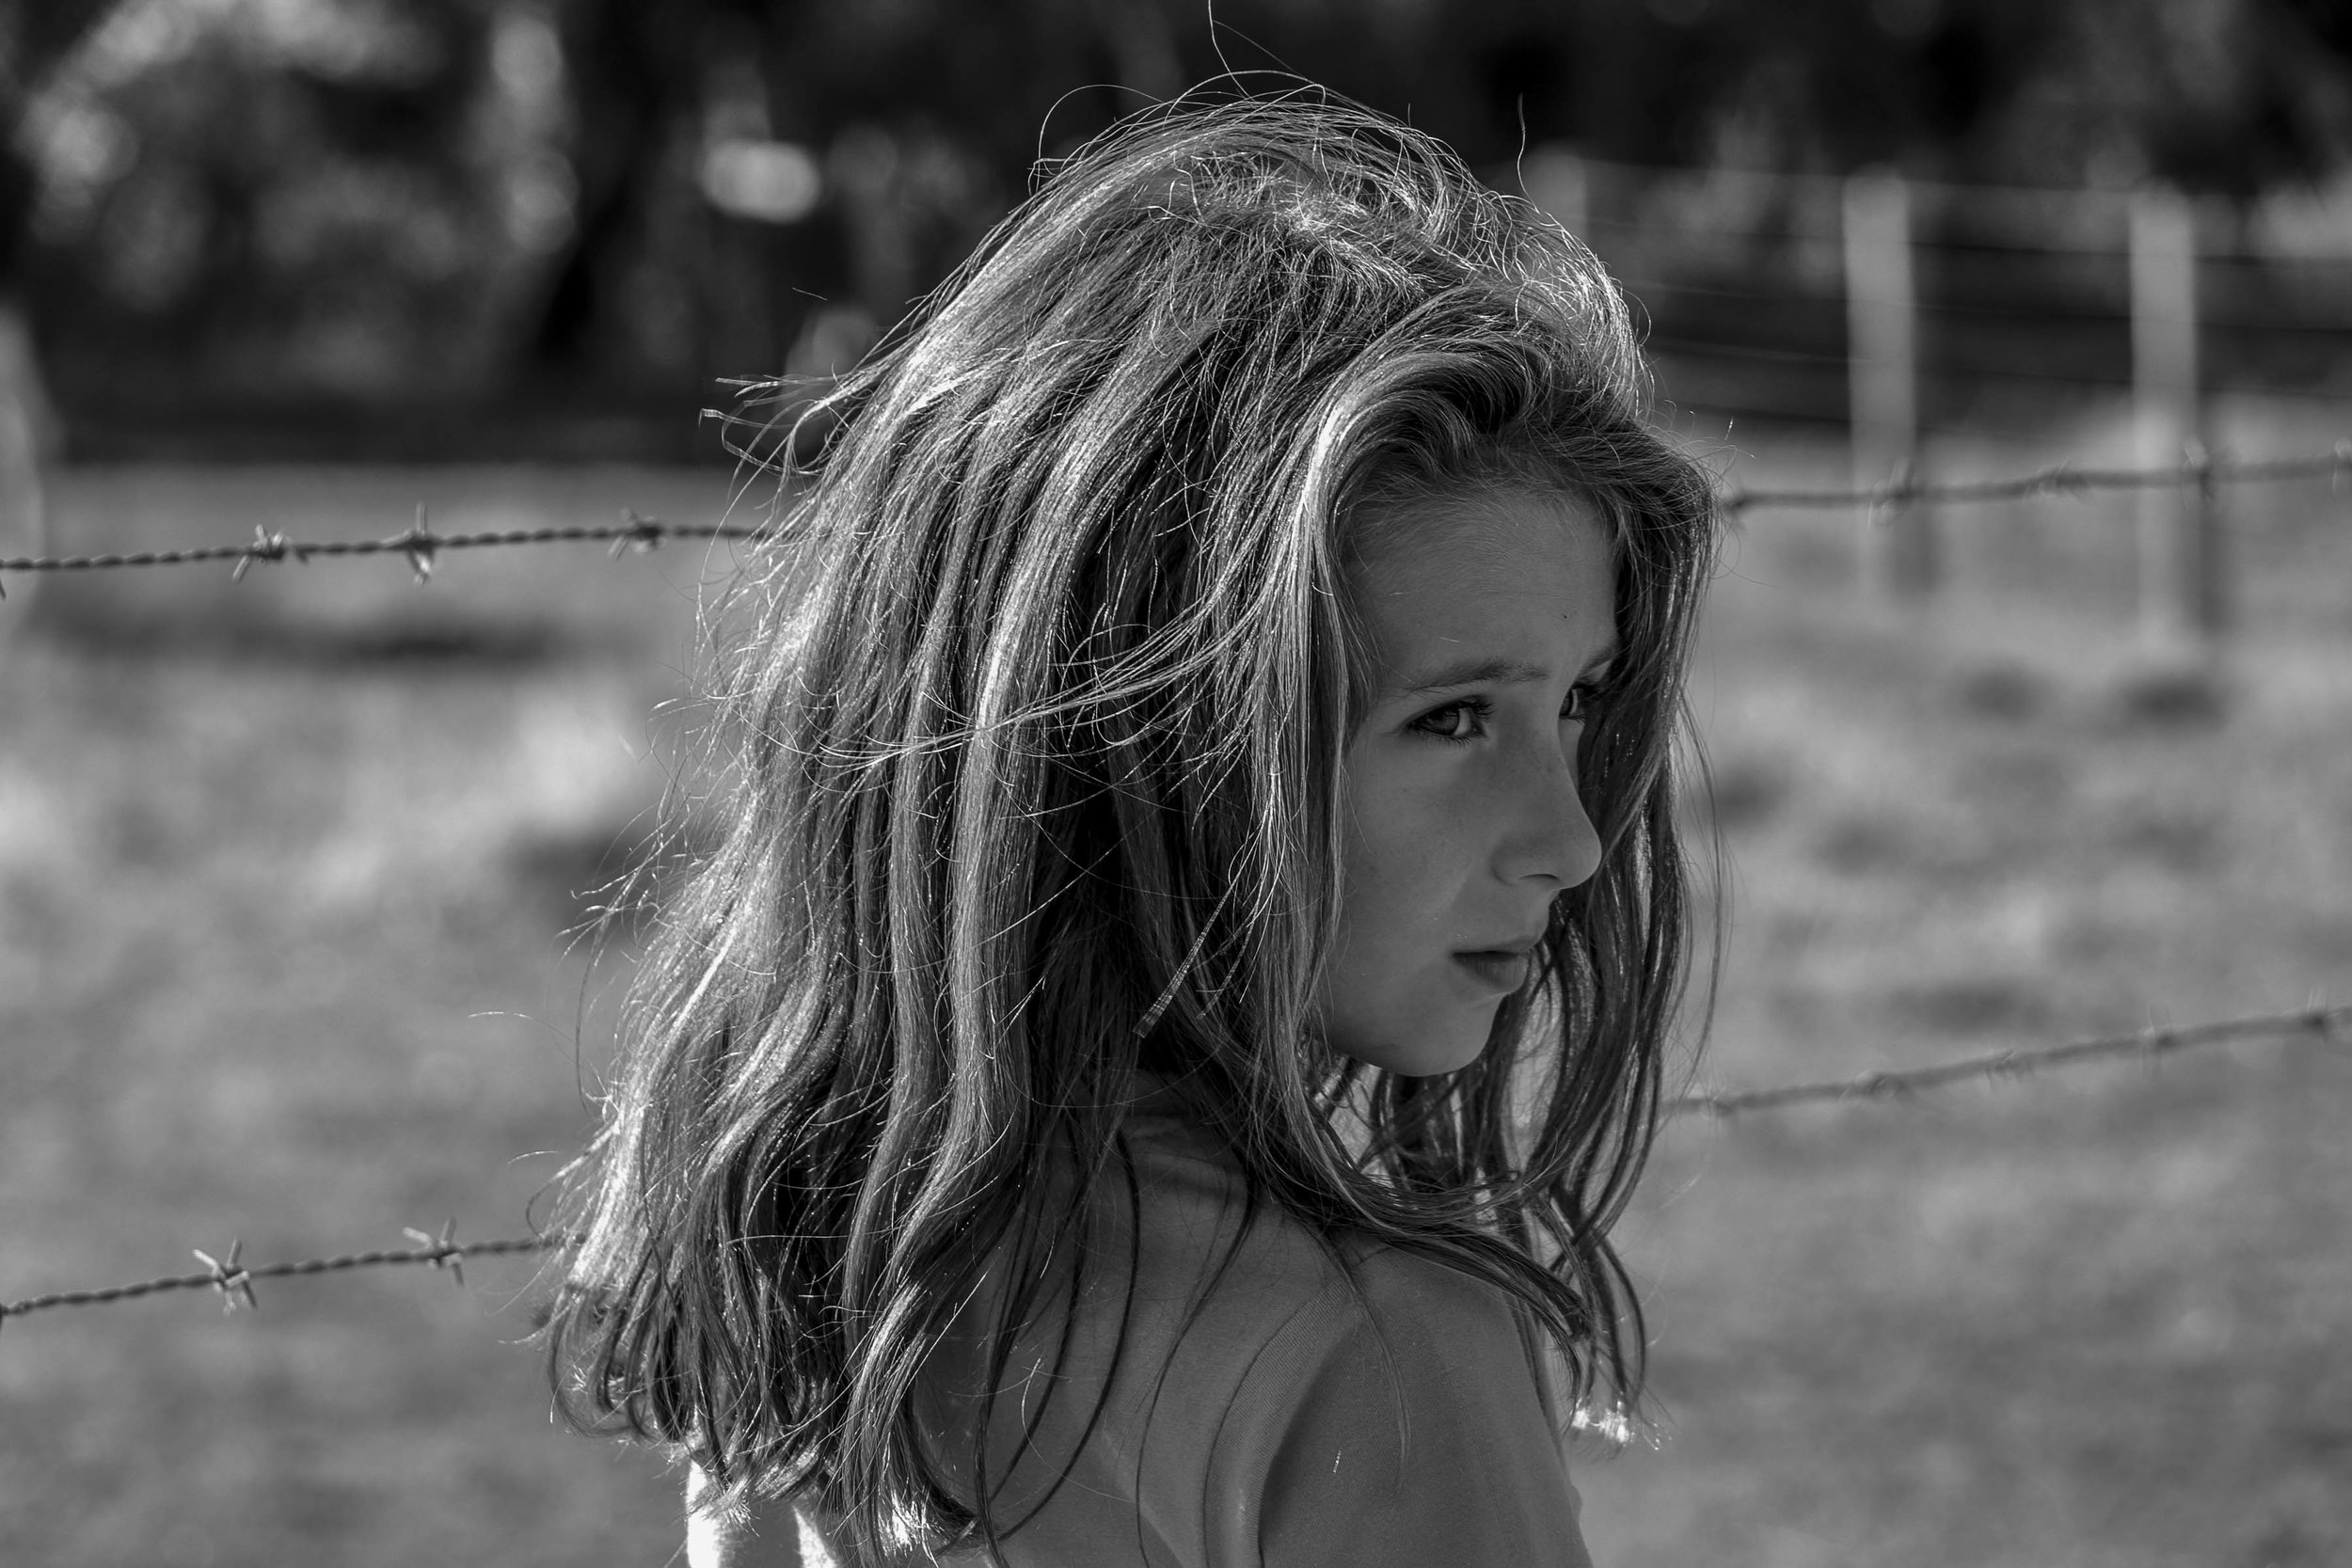 Photographer: Kristen Latimer